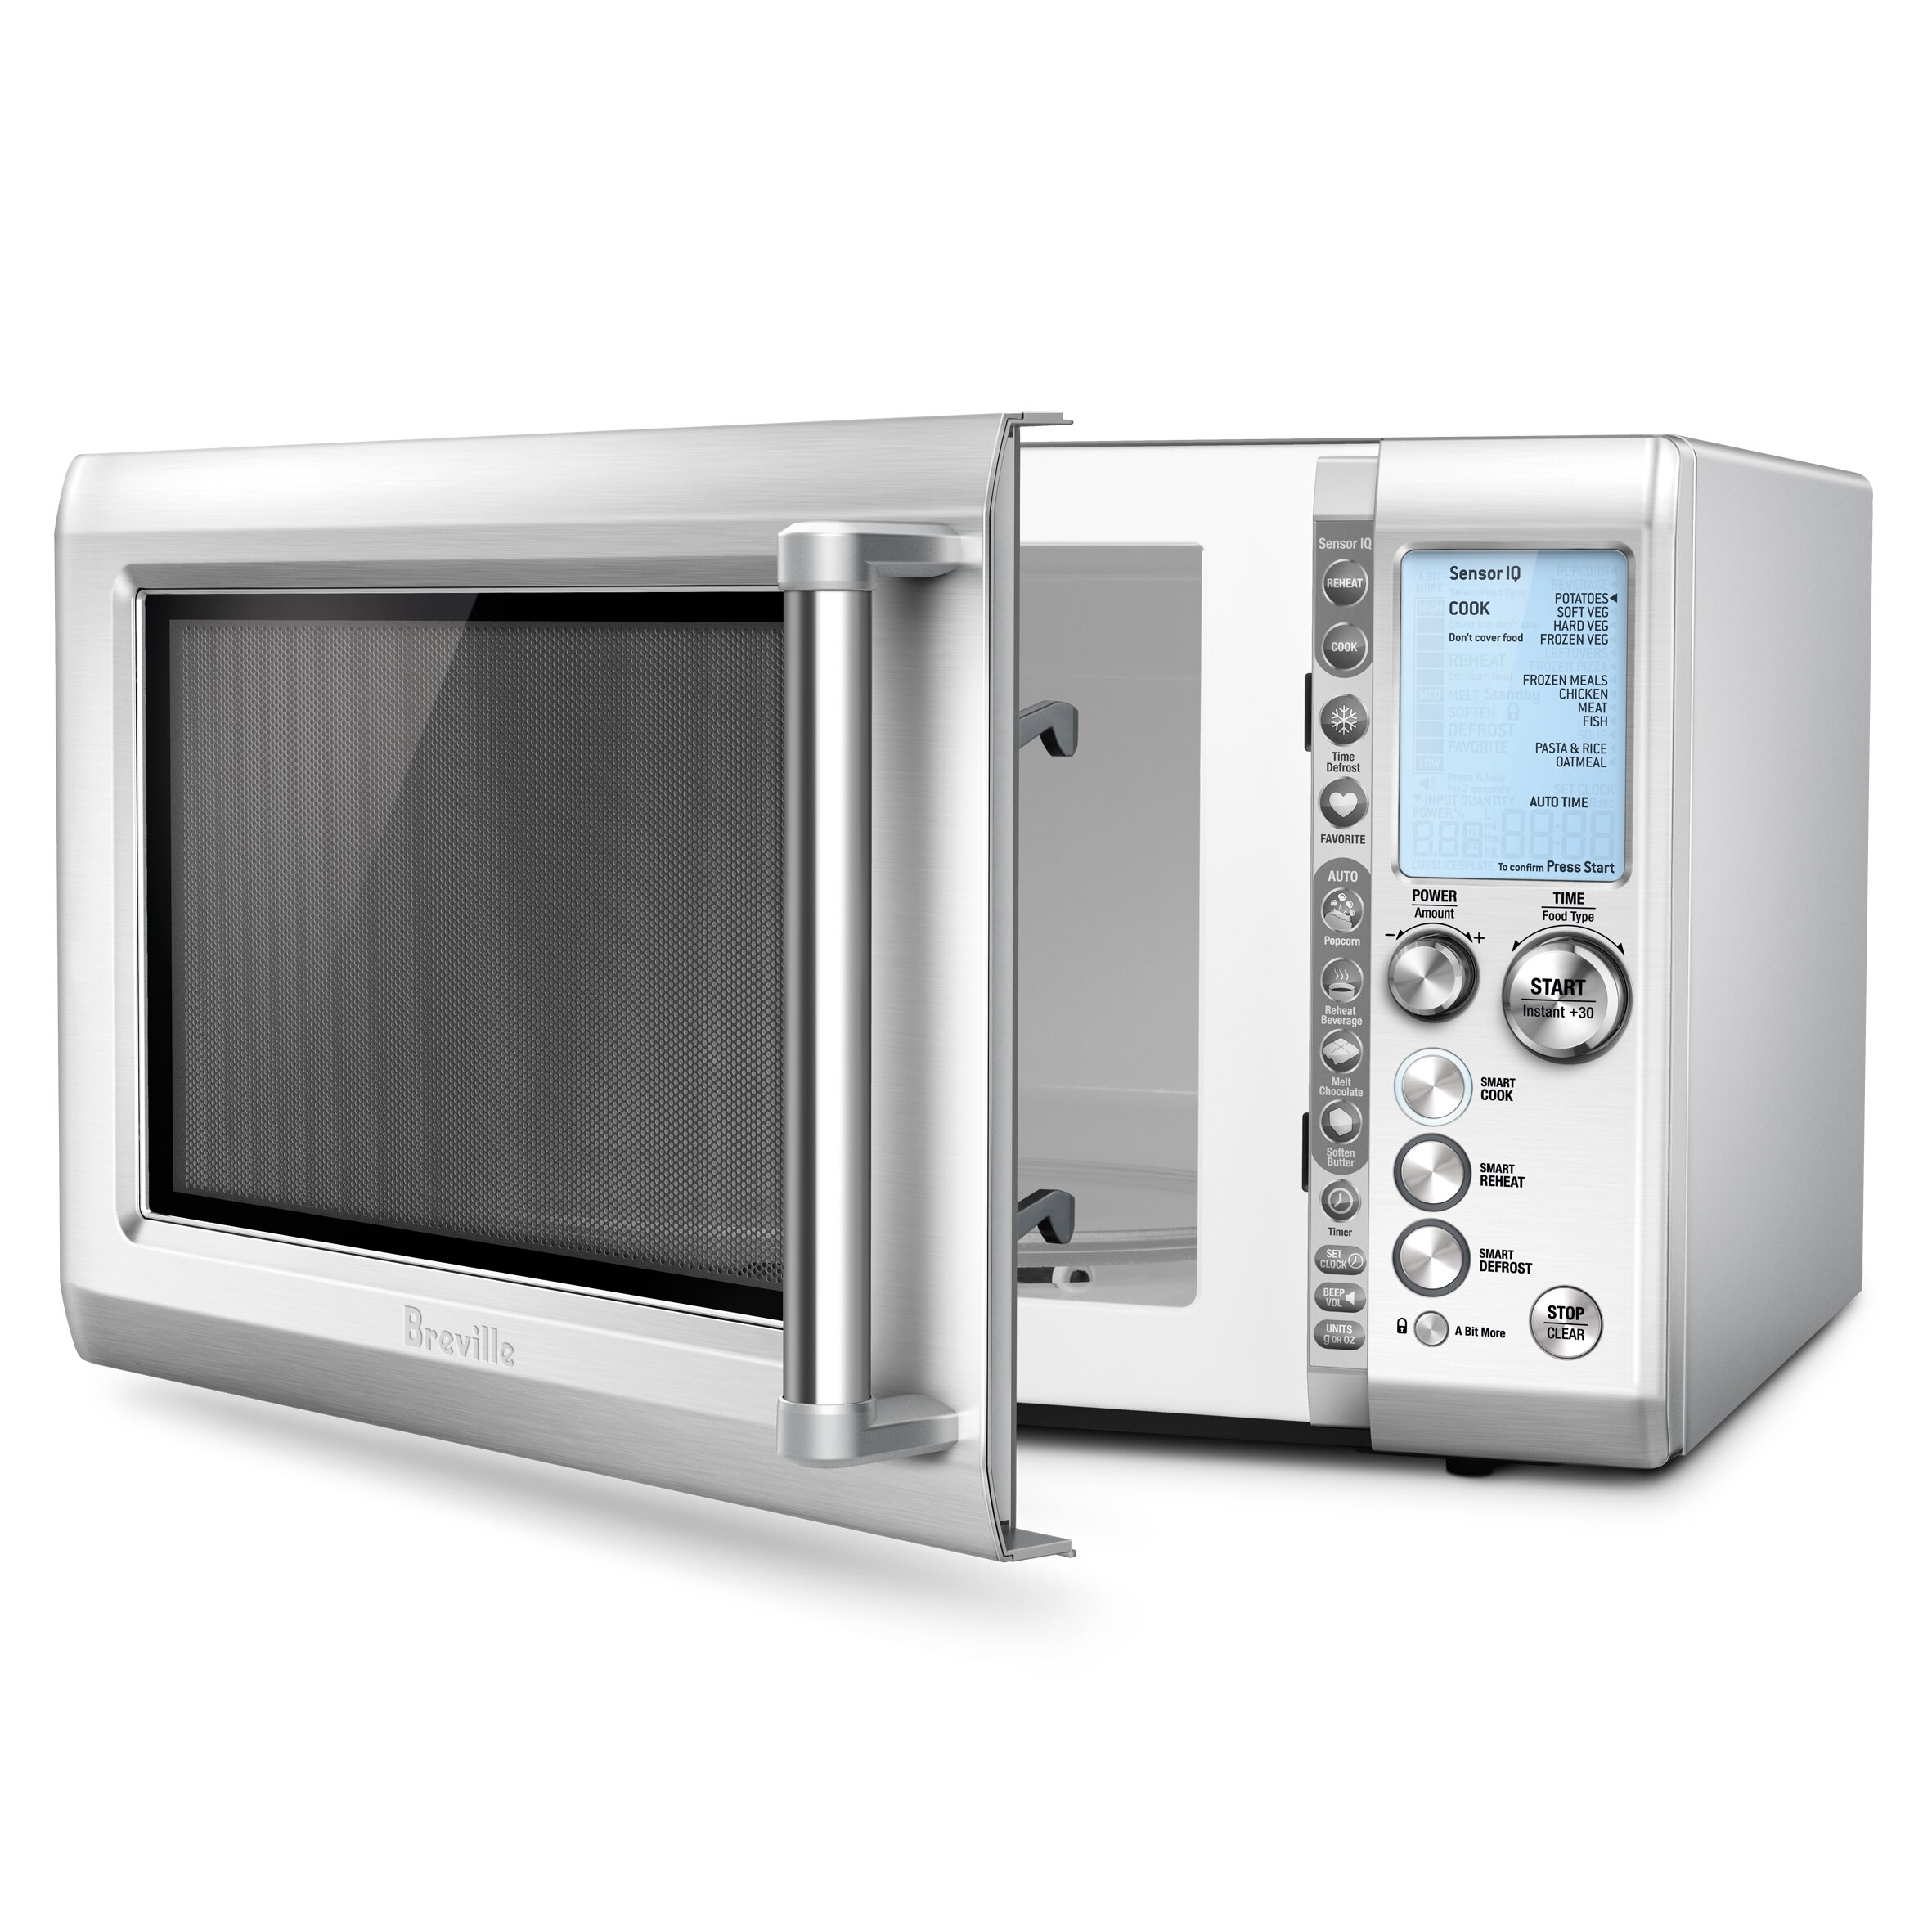 Breville 1 2 Cu Ft 1100w Microwave Amp Reviews Wayfair